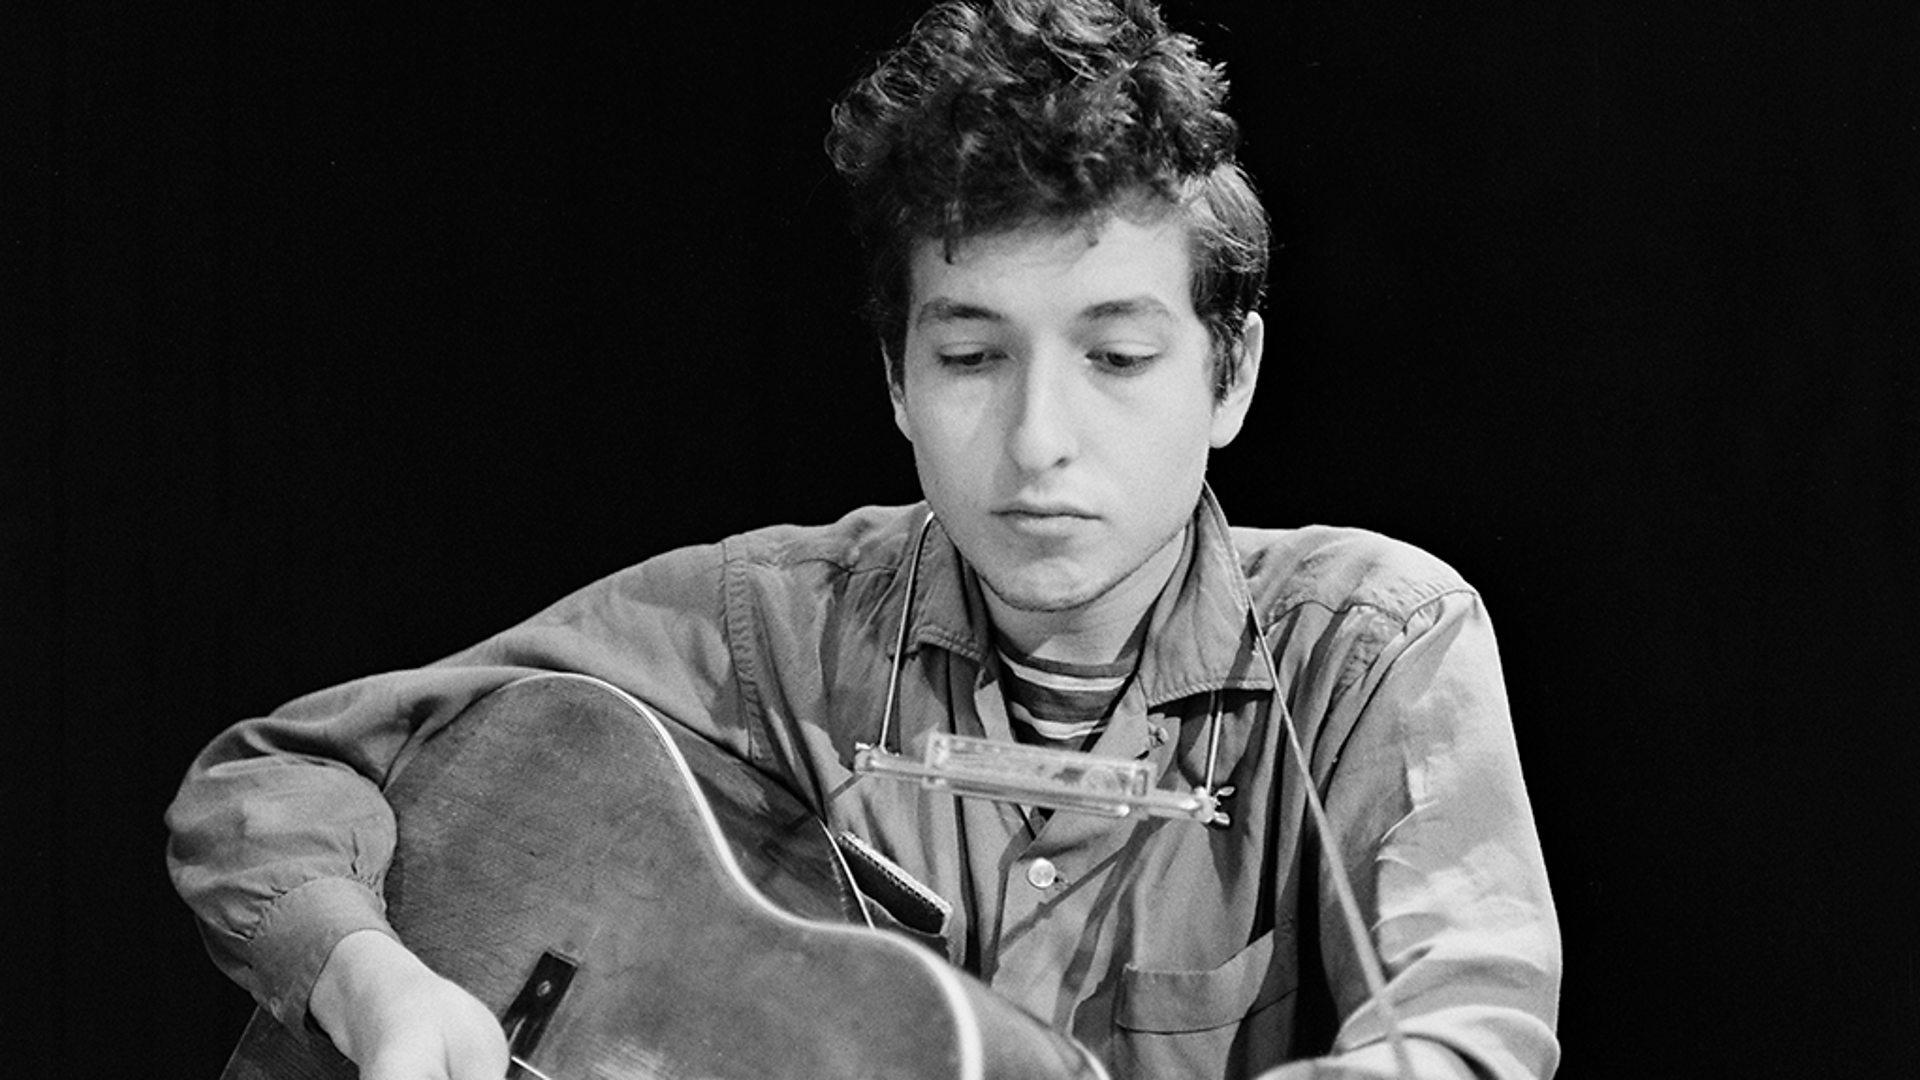 BBC Radio 4 celebrates Bob Dylan ahead of his 80th birthday